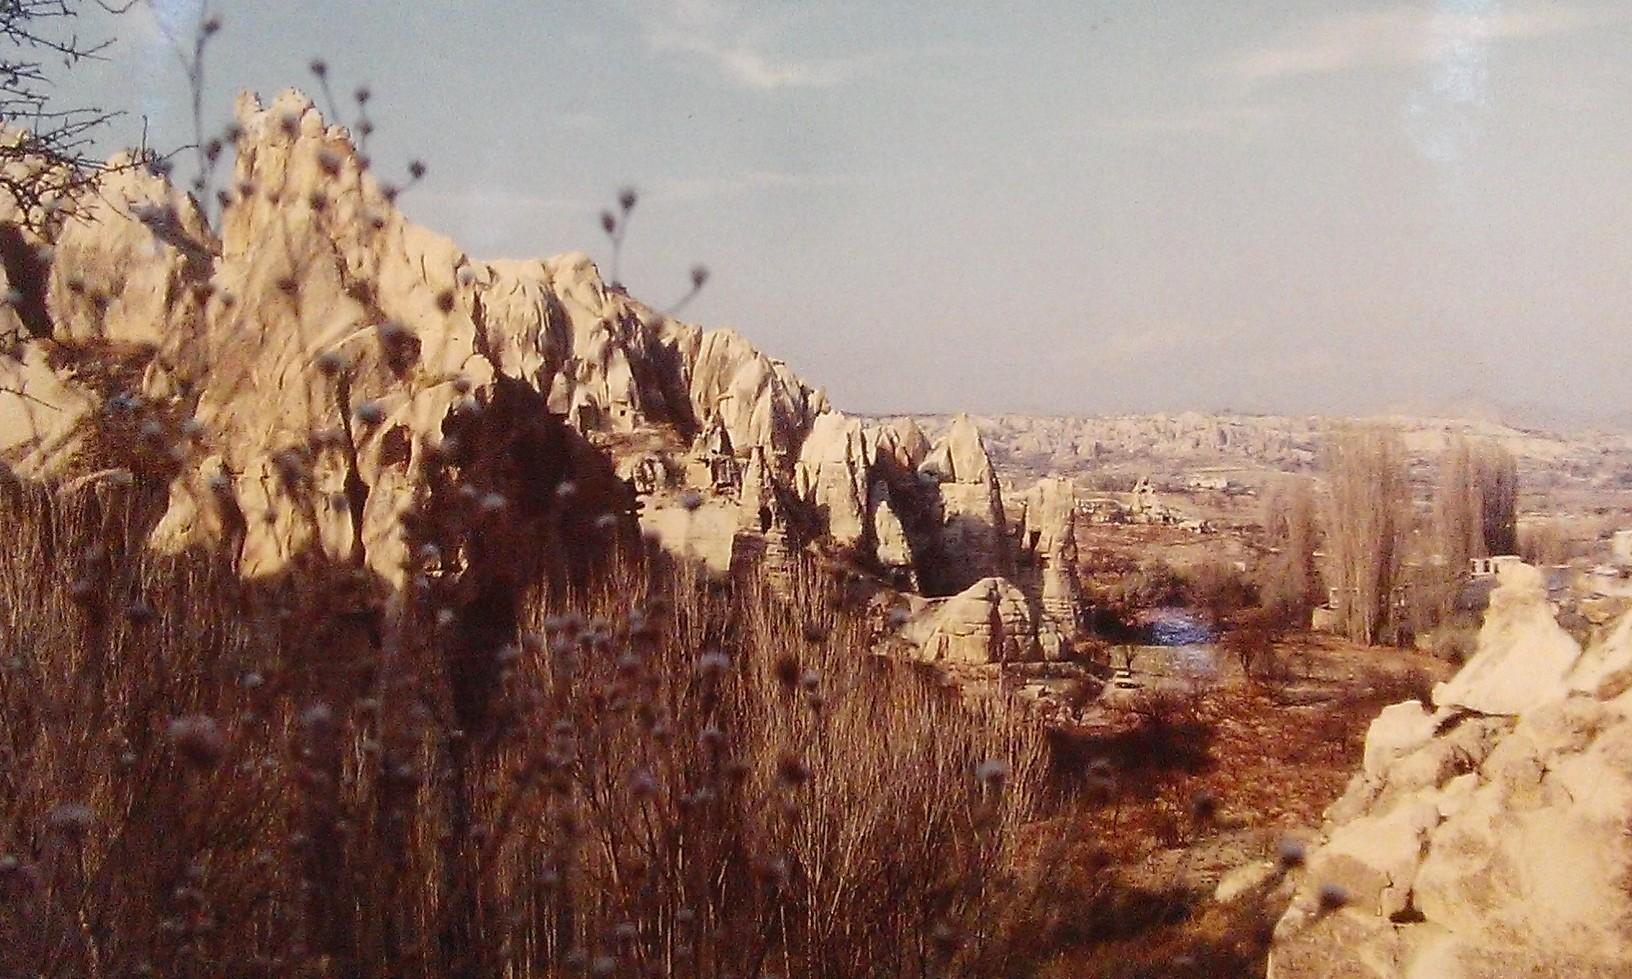 Cappadocia in Winter - Göreme National Park and the Rock Sites of Cappadocia - Turkey Cathrin Eszbach